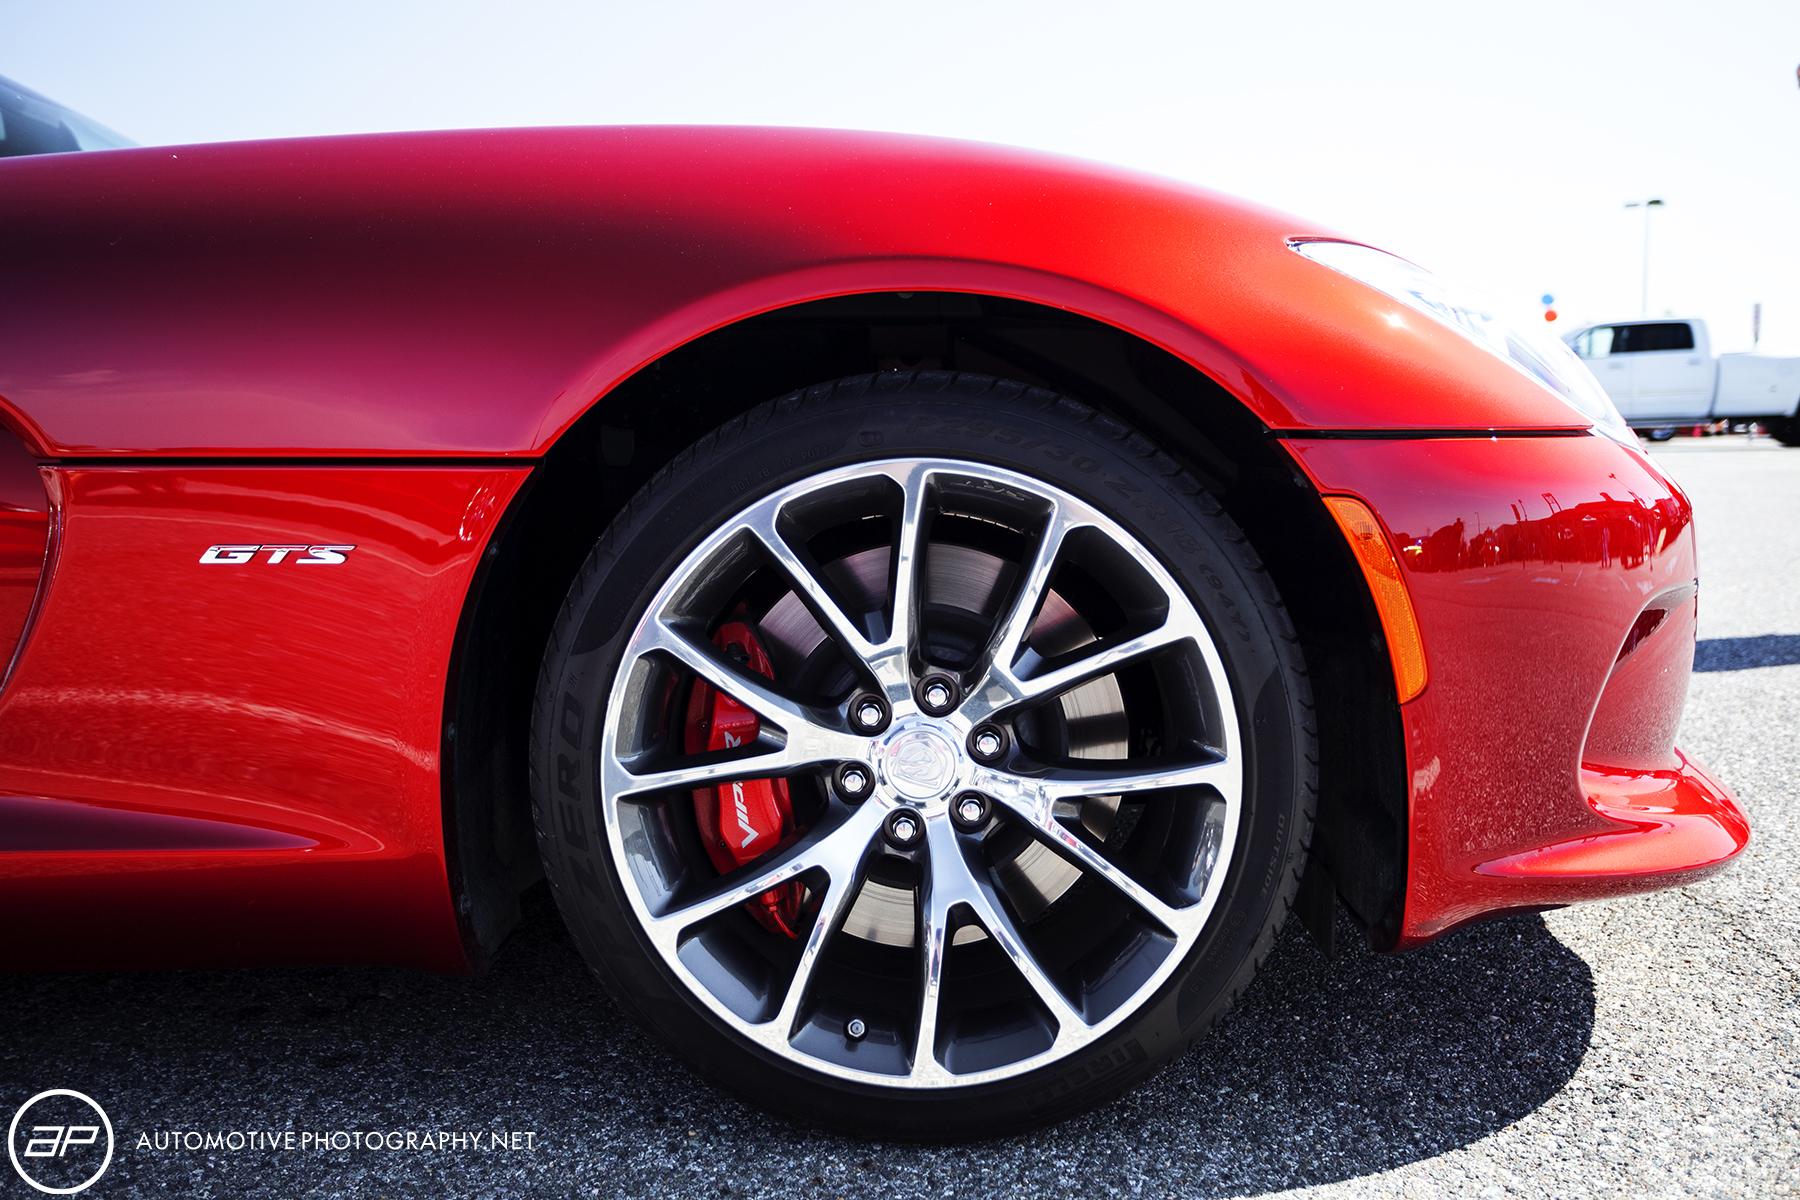 Dodge Viper GTS - Red